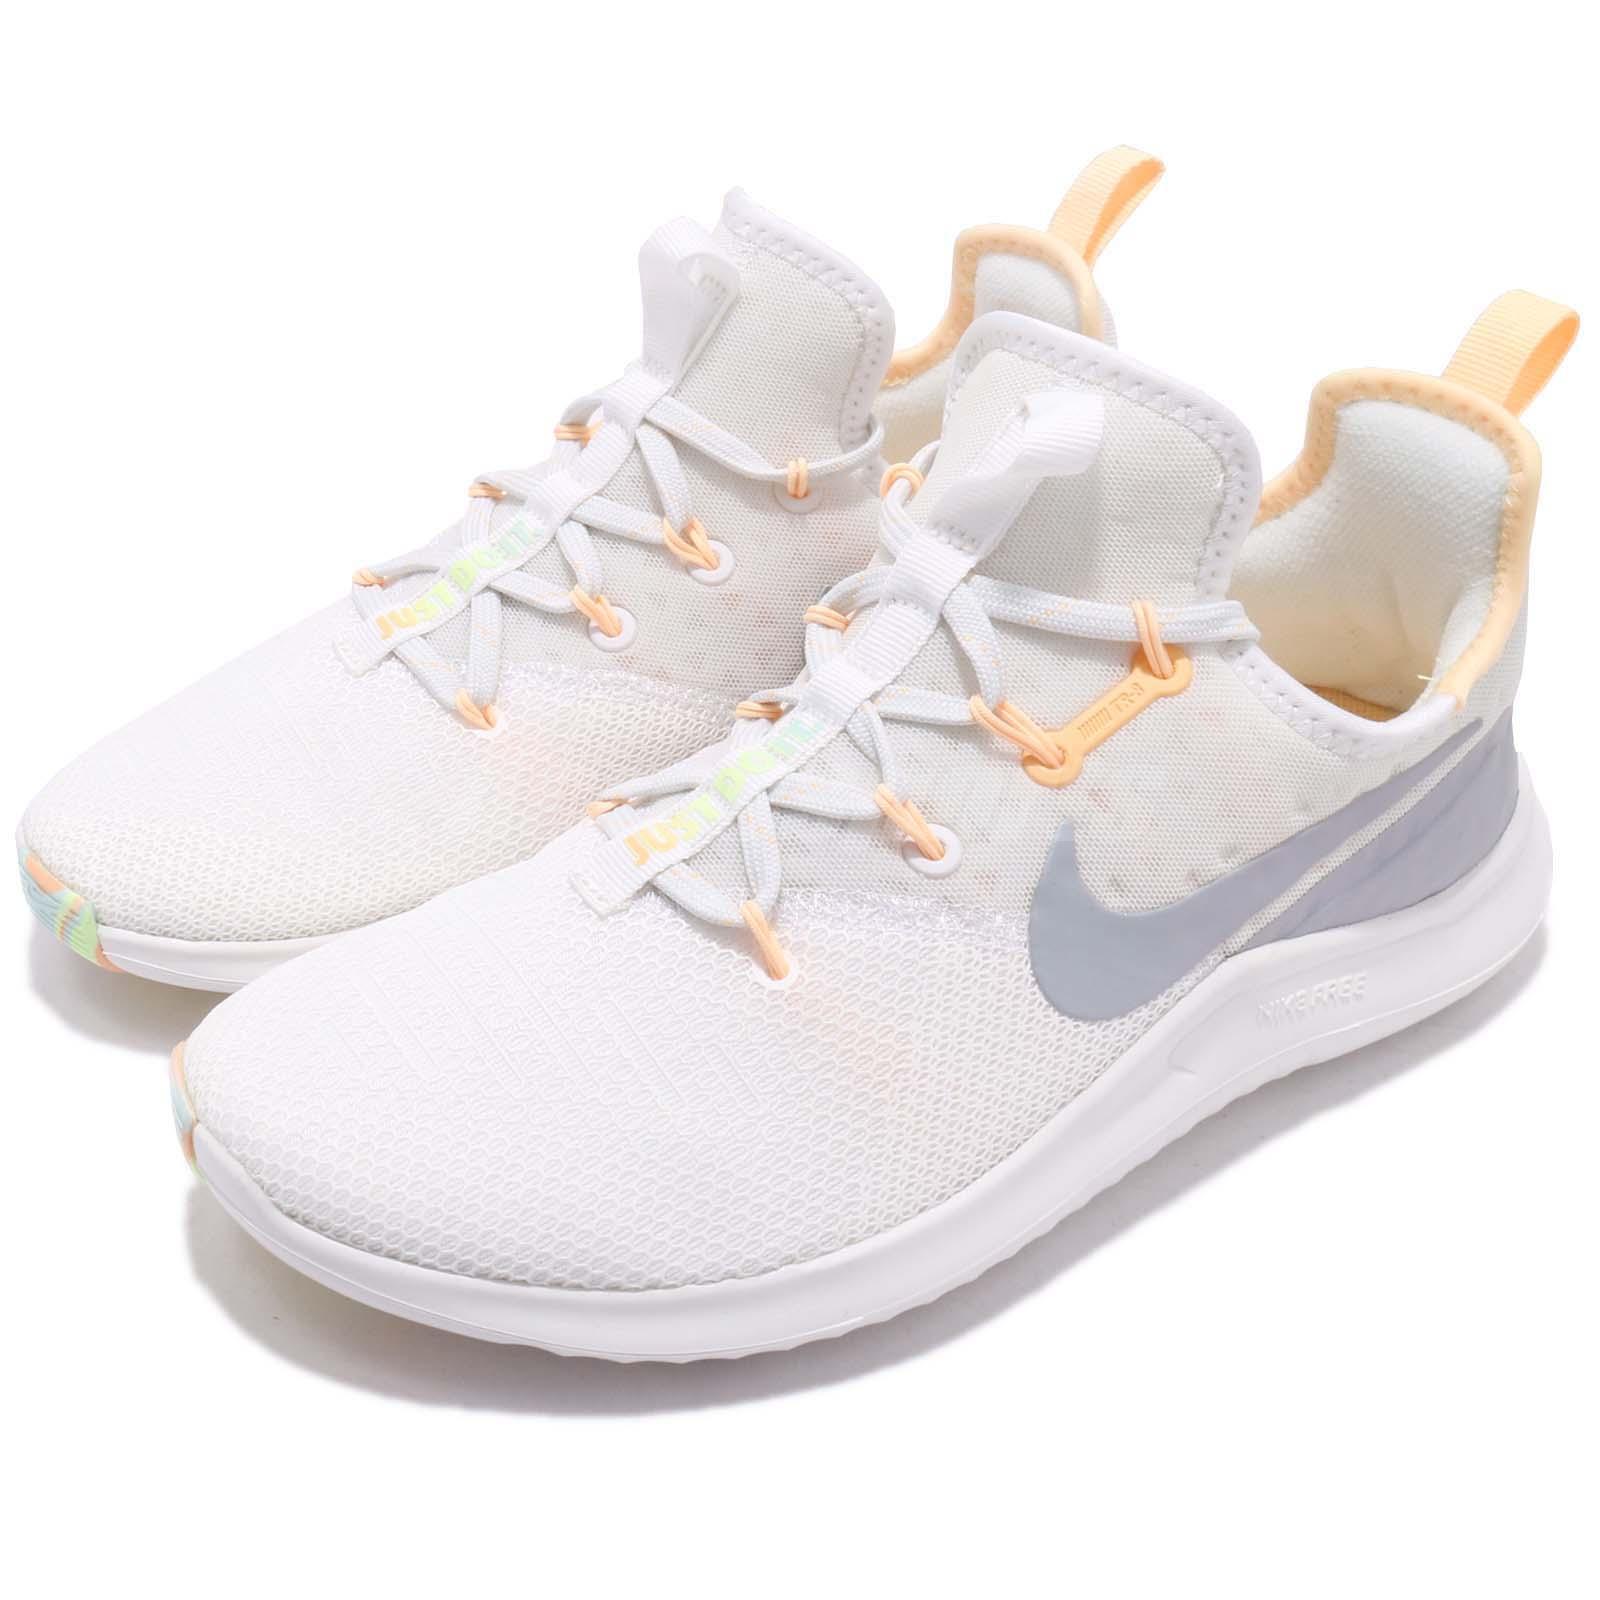 Wmns Nike Free TR 8 Rise VIII Summit White Women Cross Training shoes AH8183-100